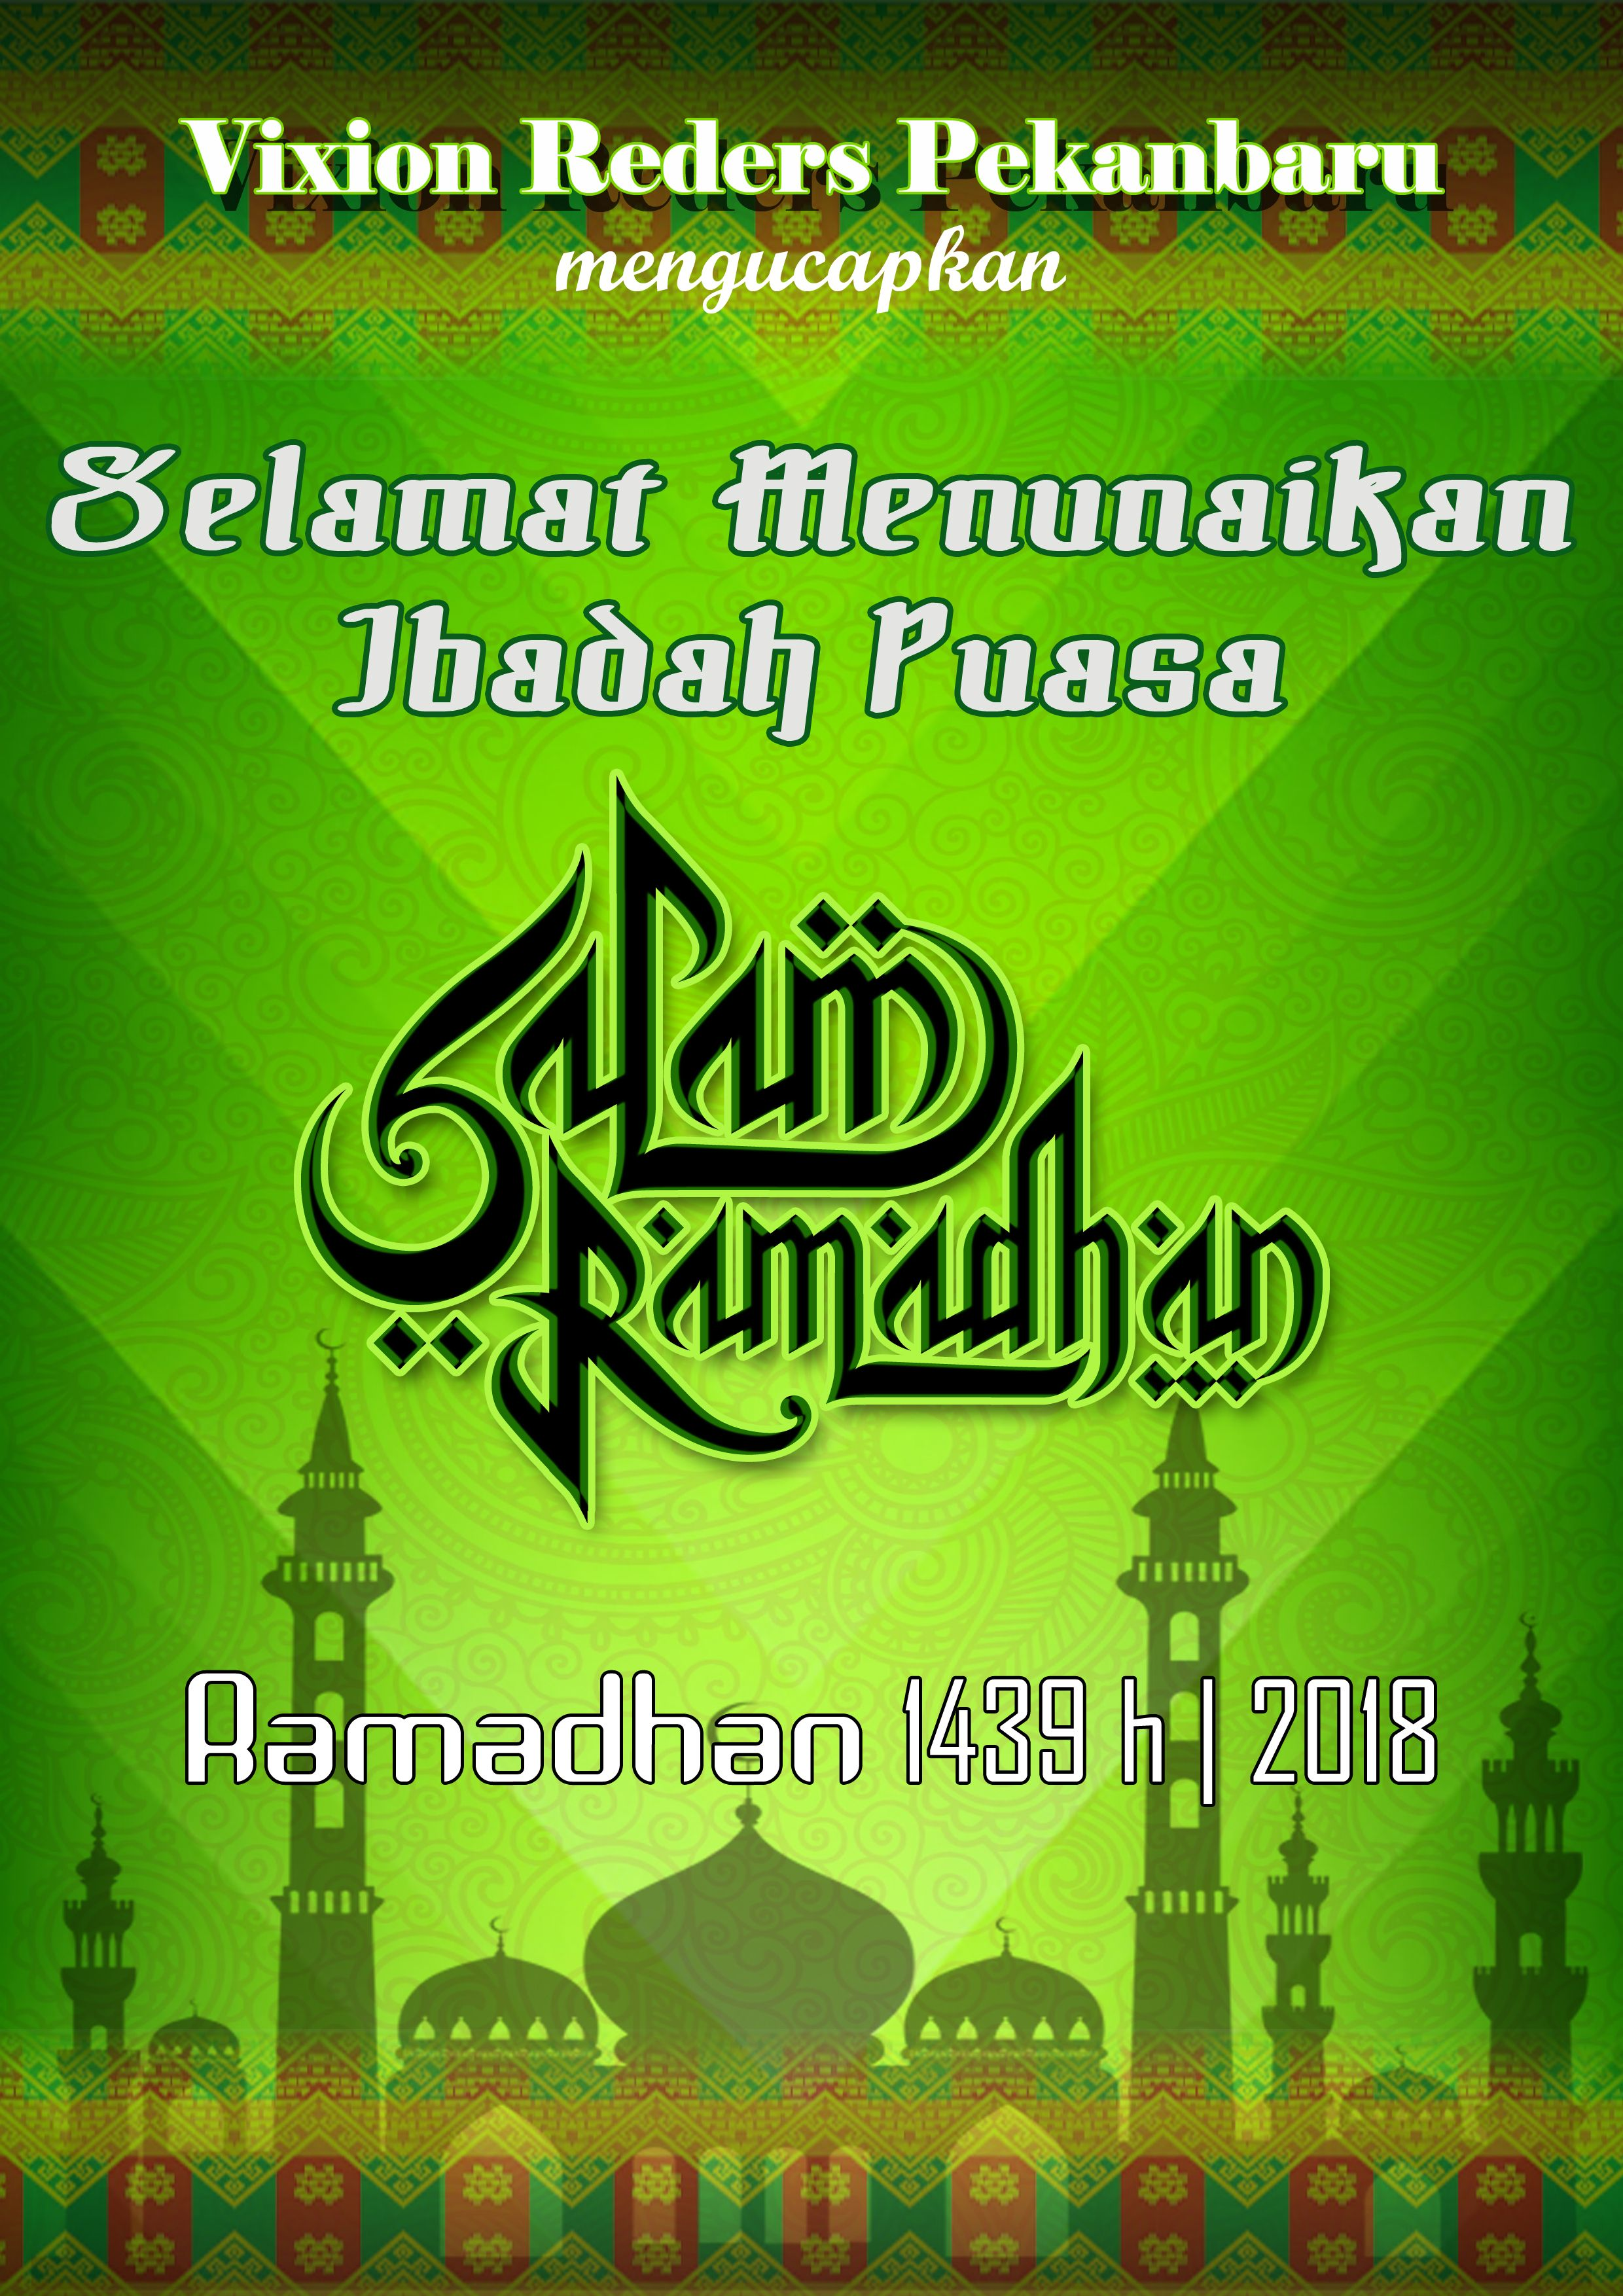 Baner Ucapan Selamat Bulan Ramadhan